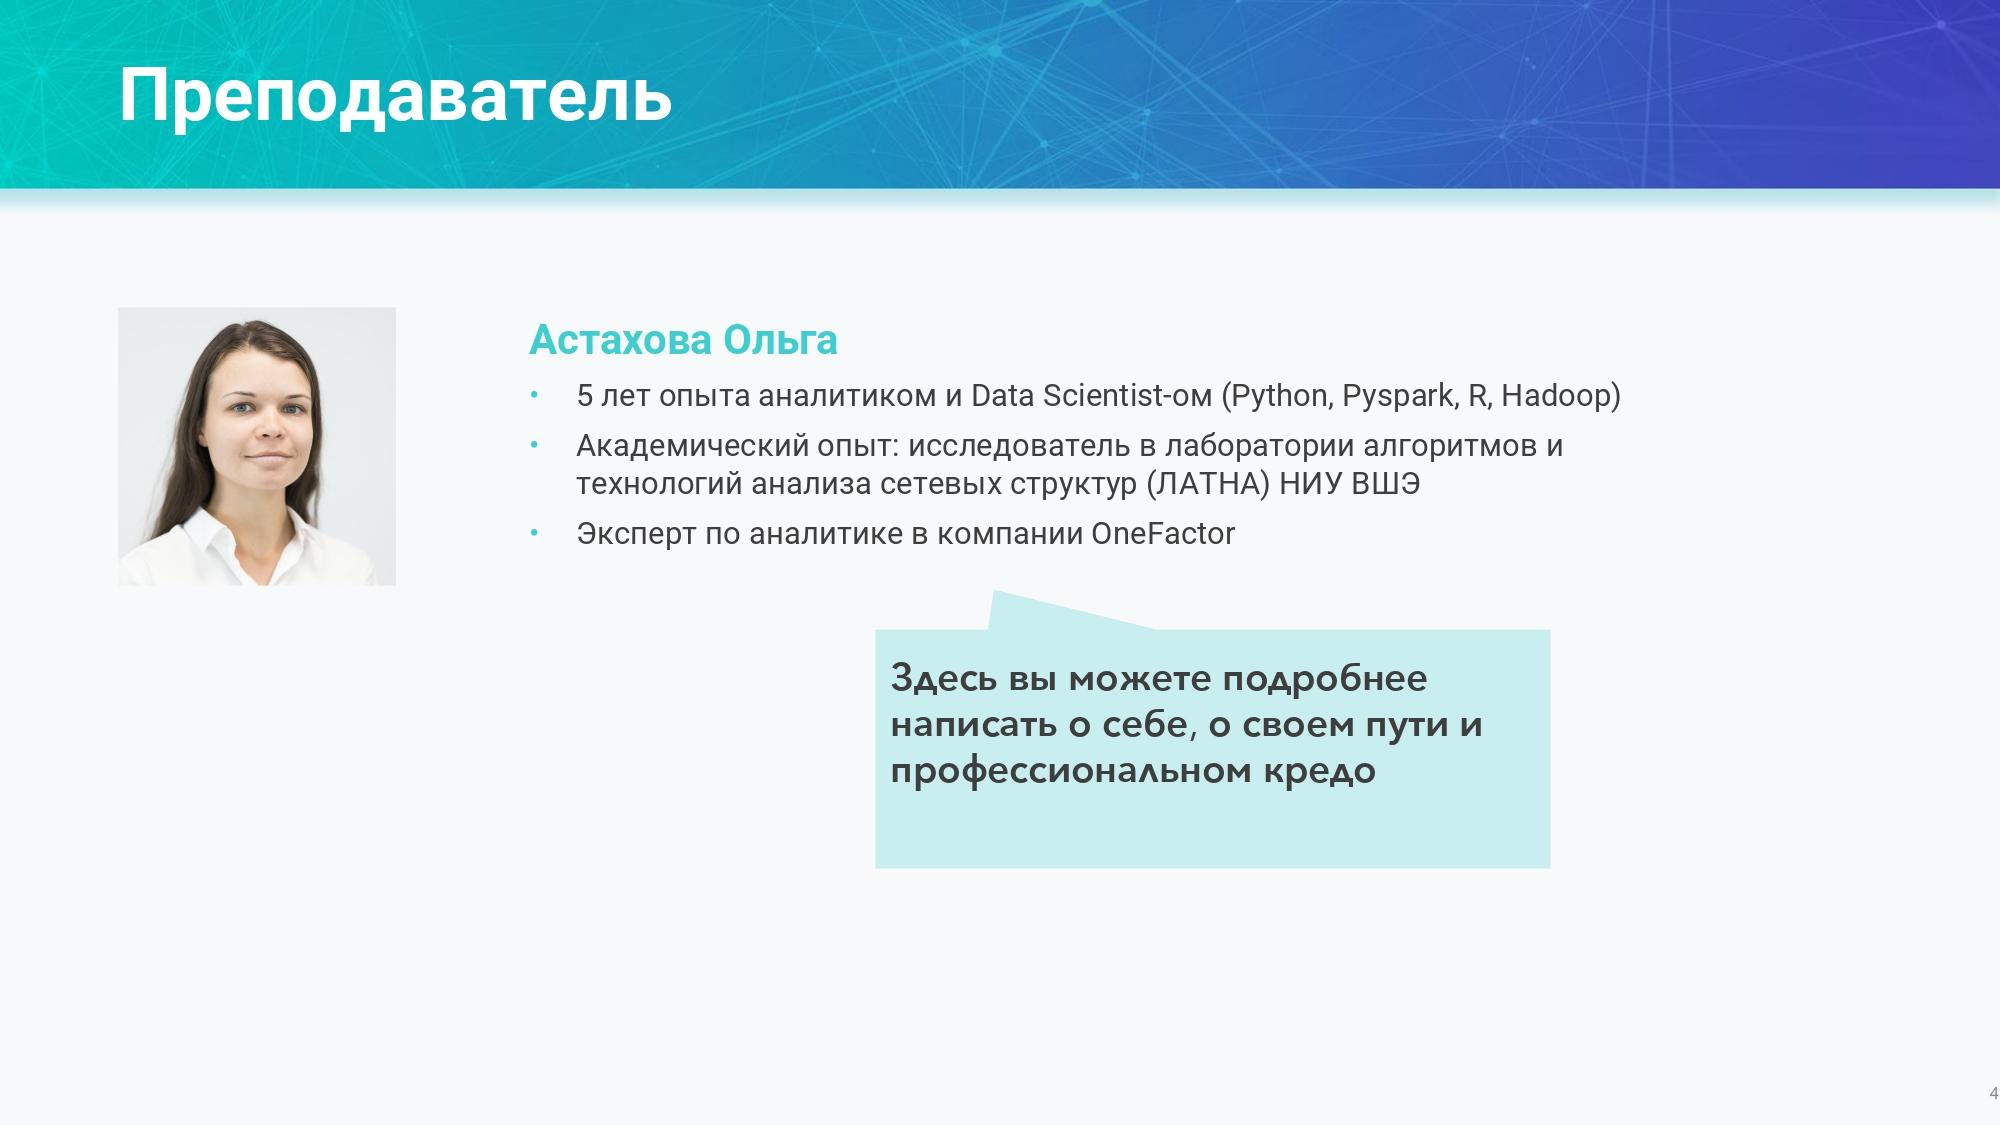 Шаблон_презентации_вебинара_в_новом_дизайне_с_подсказками_page_0004-73510-7dbc1c.jpg